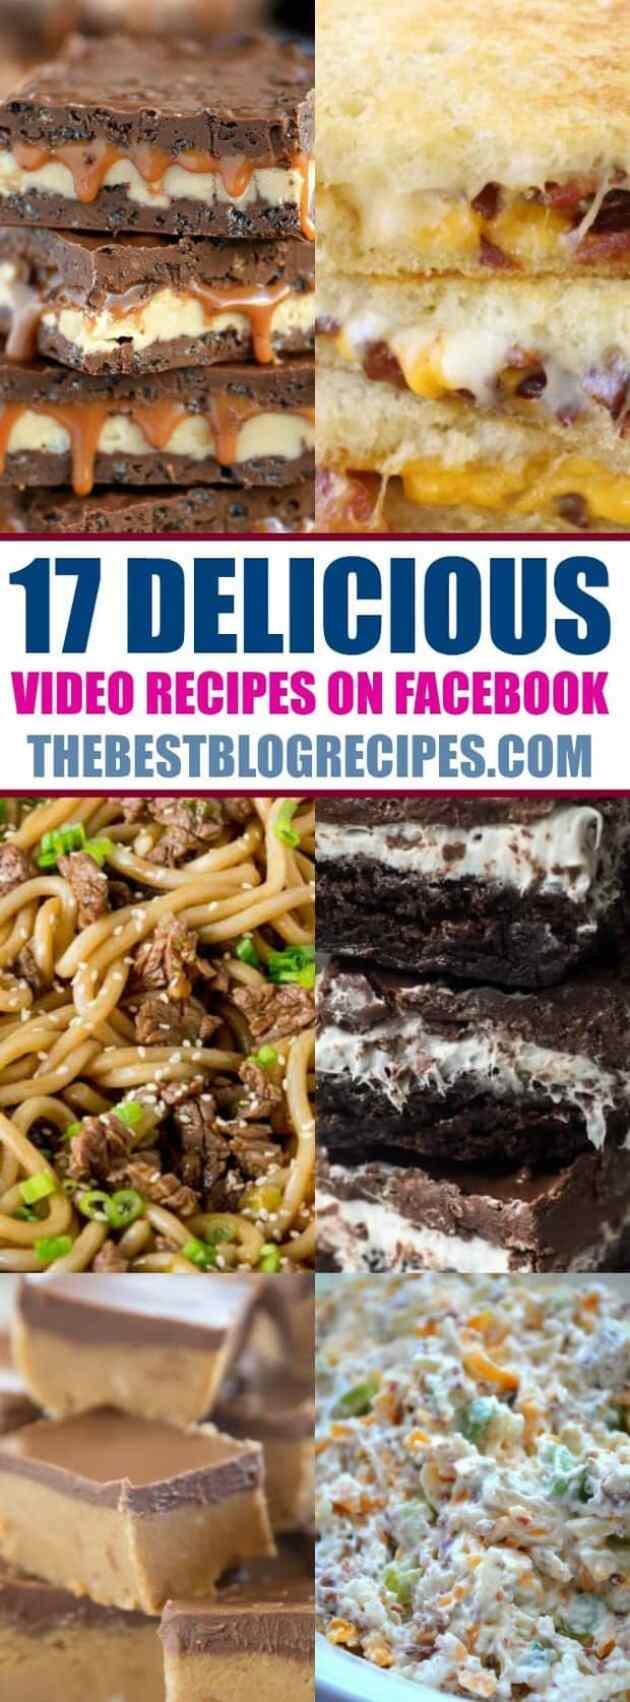 17 Delicious Video Recipe on Facebook